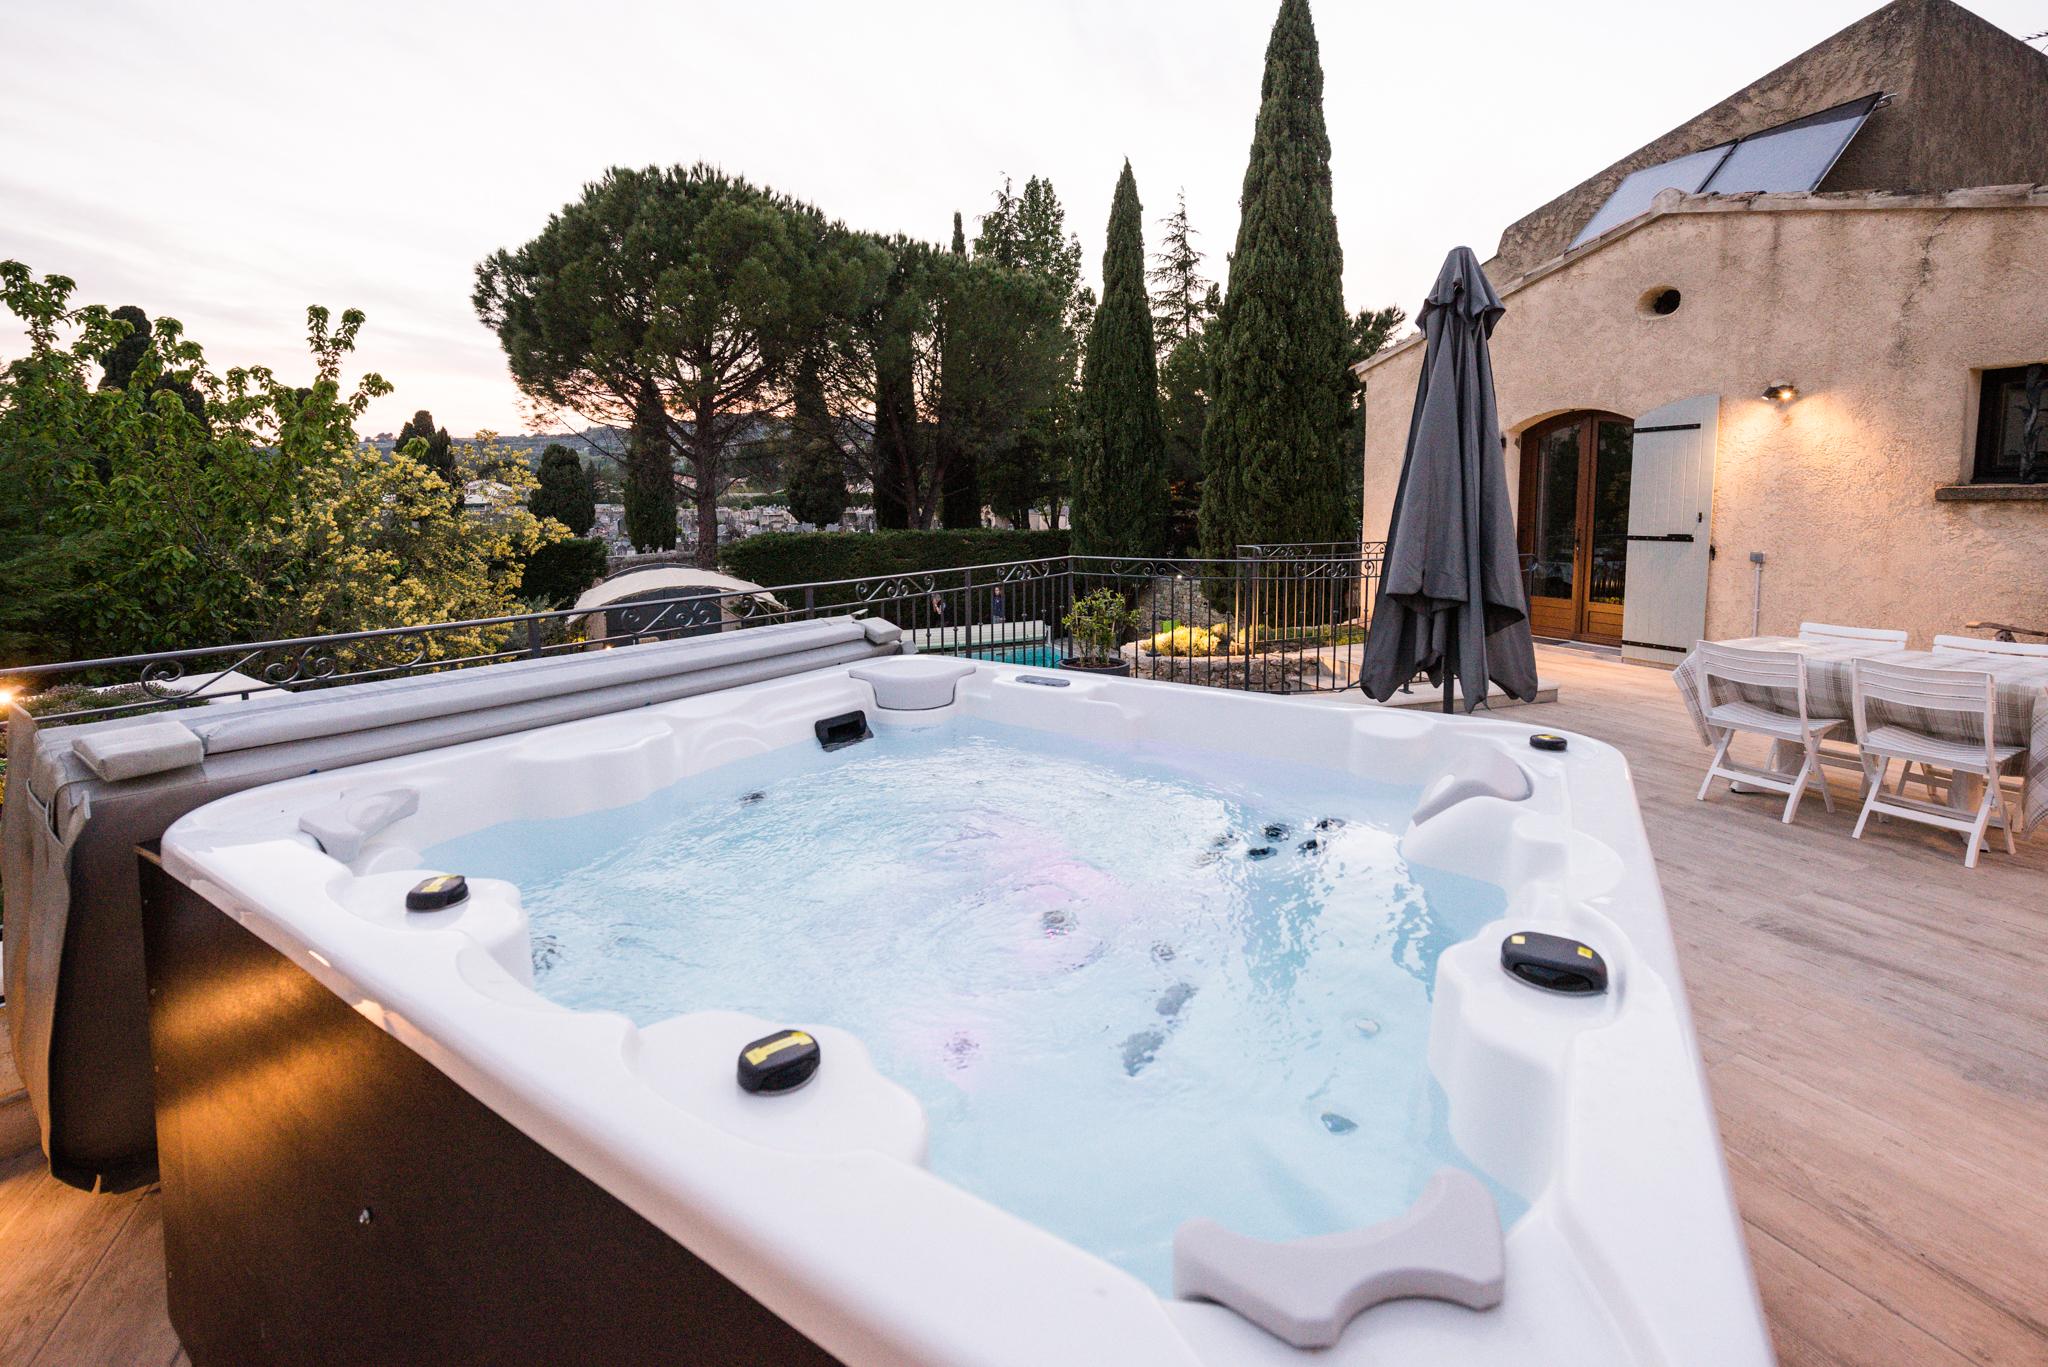 feriebolig-provence-privat-pool-DSC_4754.jpg